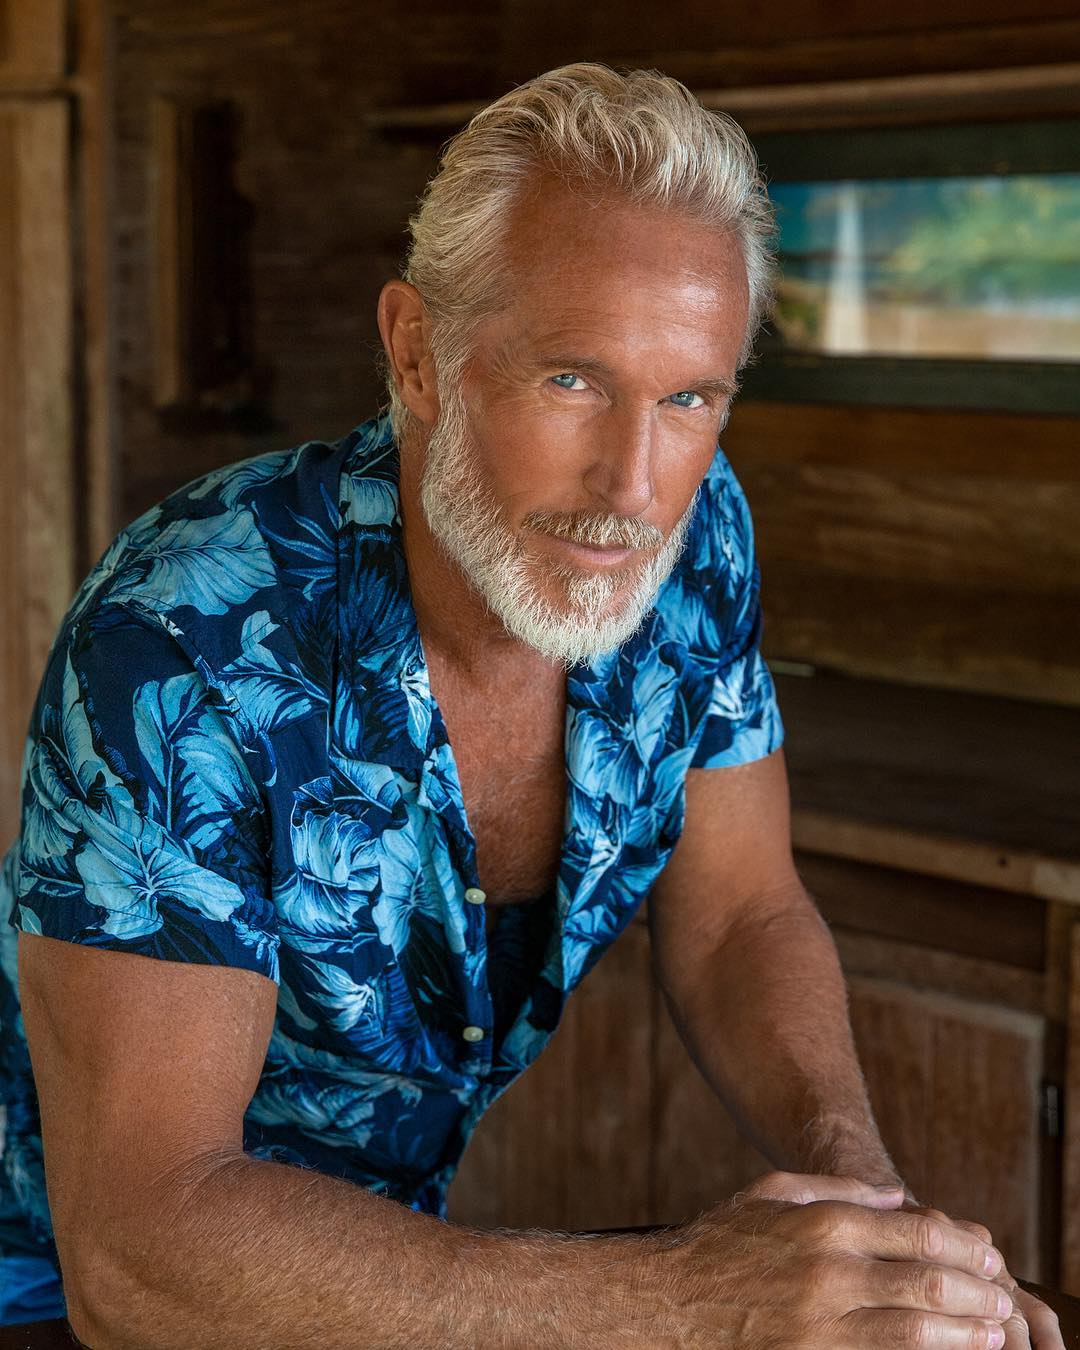 man with blue shirt